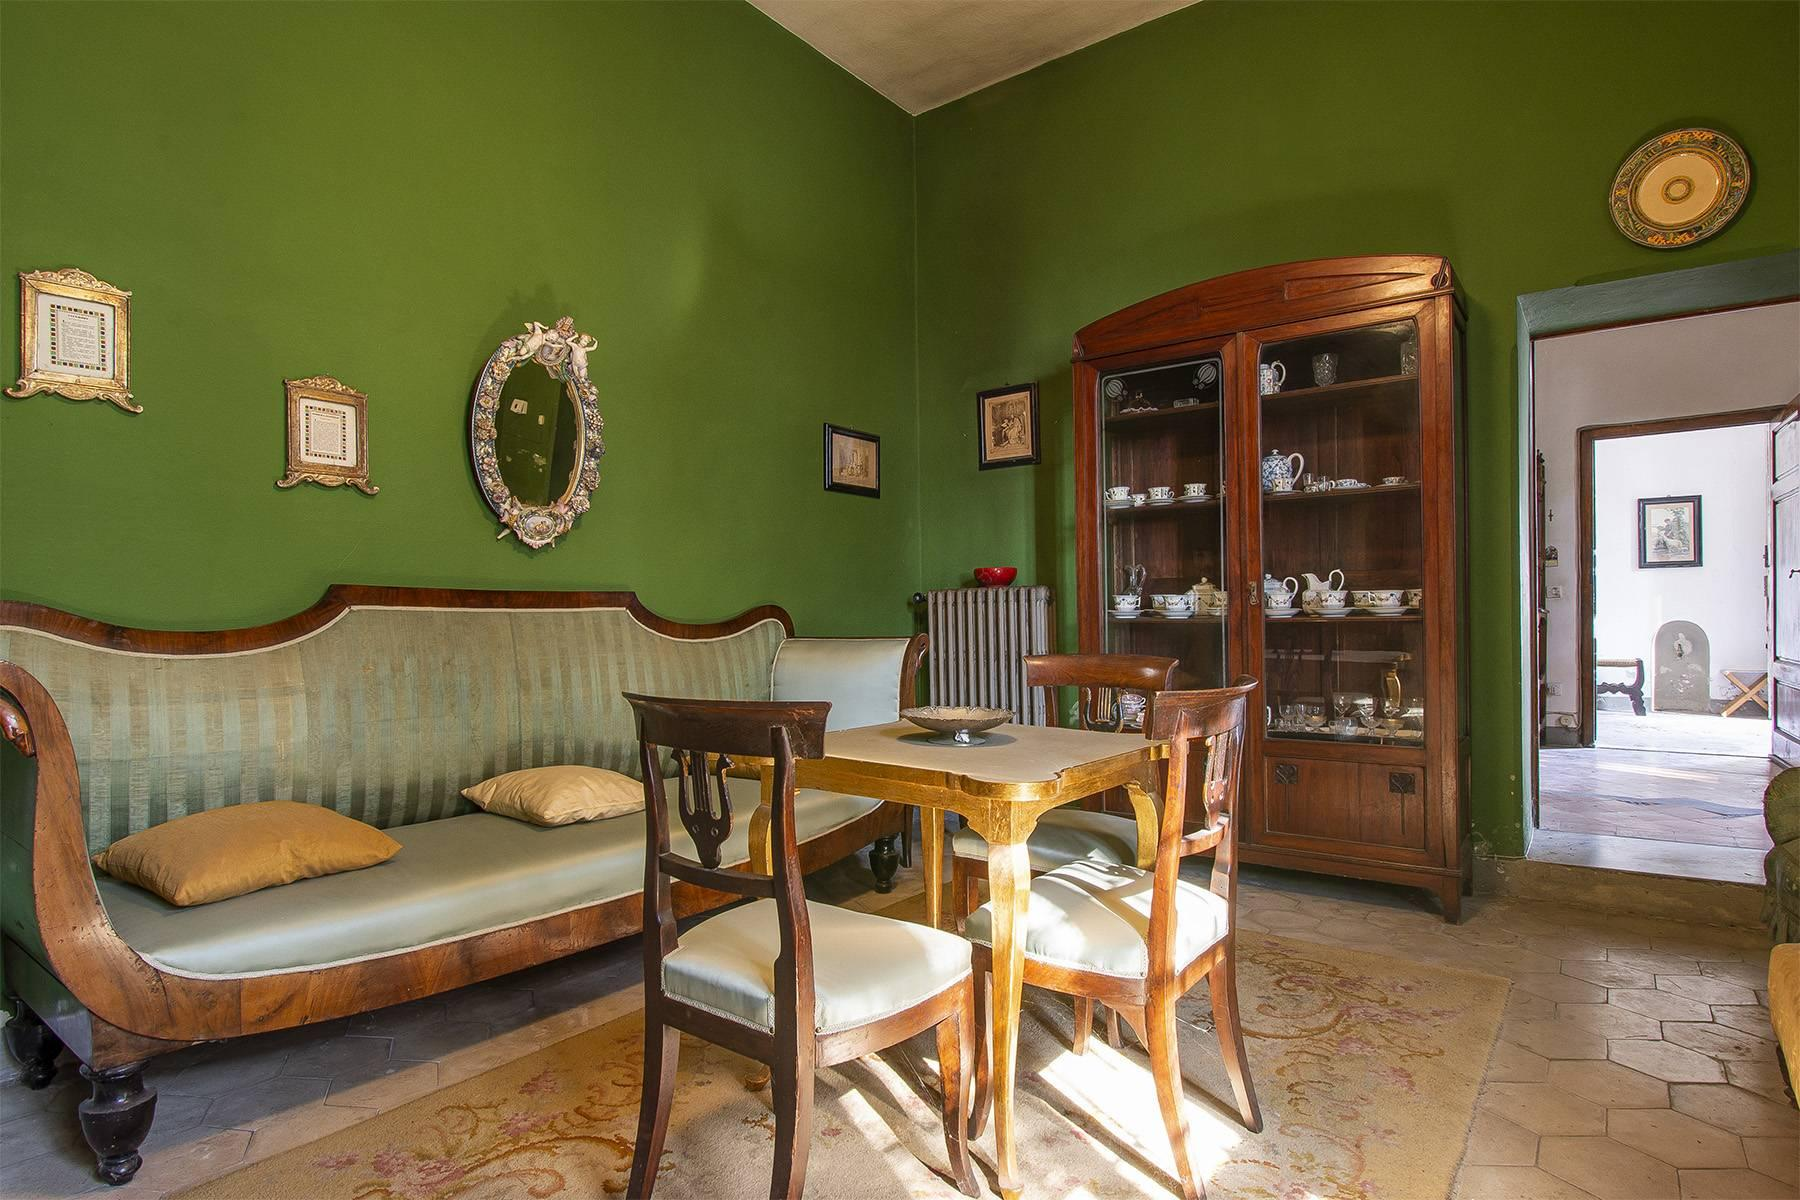 Romantic villa on the hills between Pisa and Lucca - 6